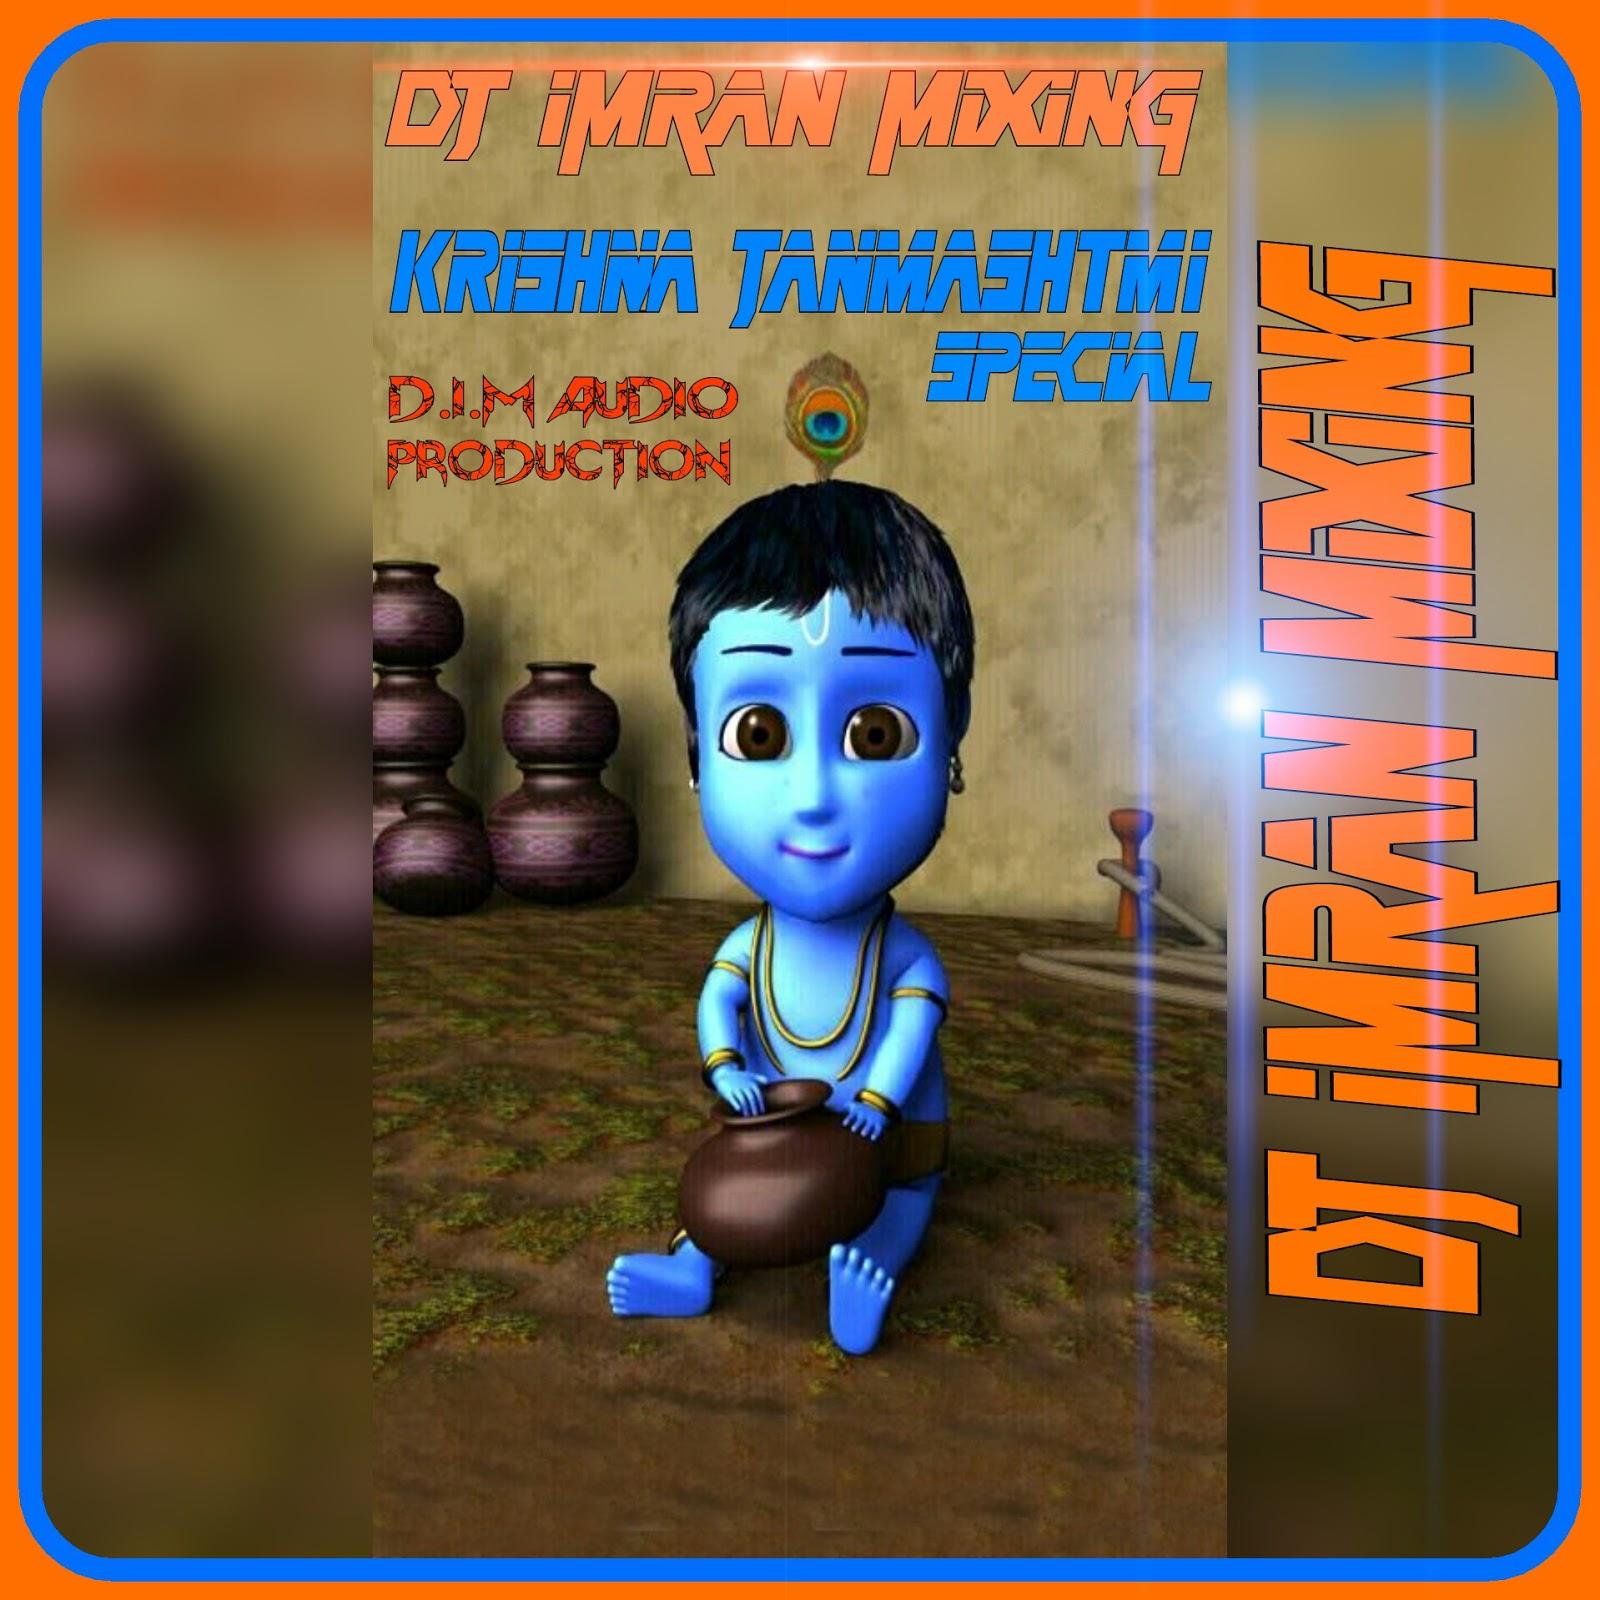 Imran Khan Song I Am Rider Mp3 Download: DJ Imran Mixing_D.I.M Audio Sagar M.P.: July 2017